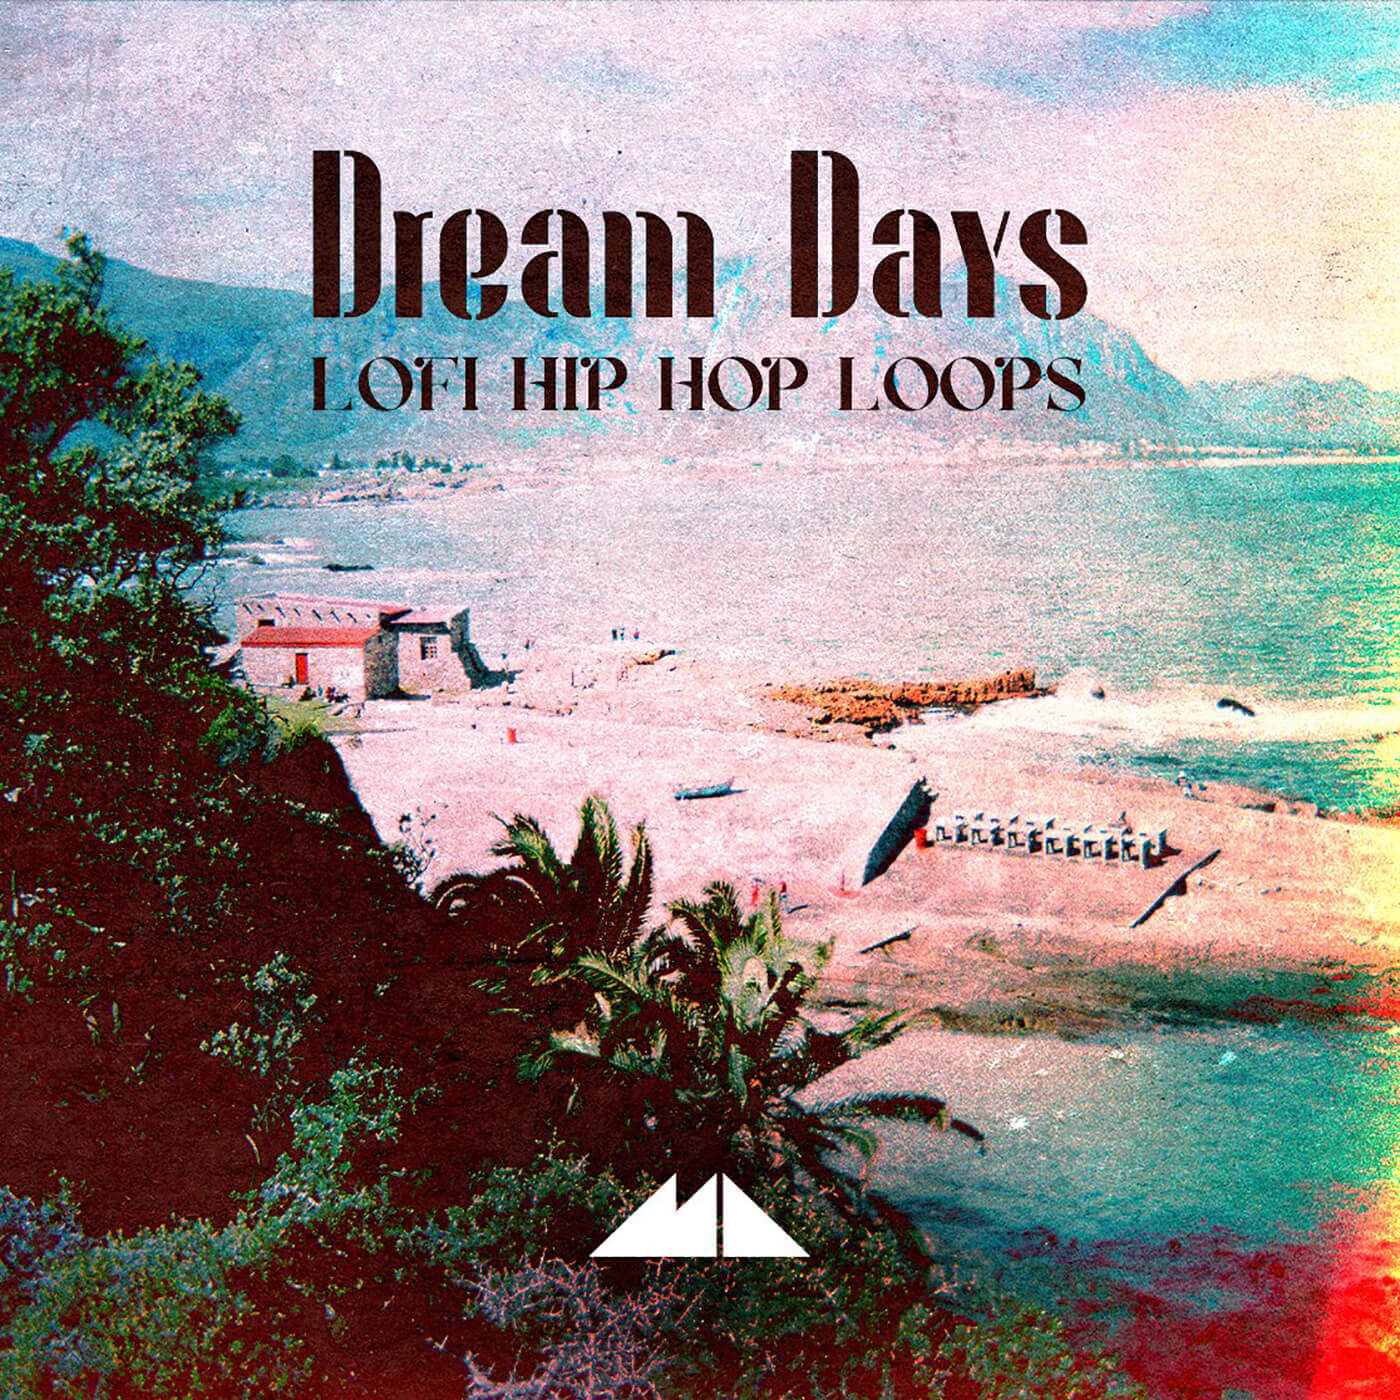 ModeAudio - Dream Days LoFi Hip Hop Loops